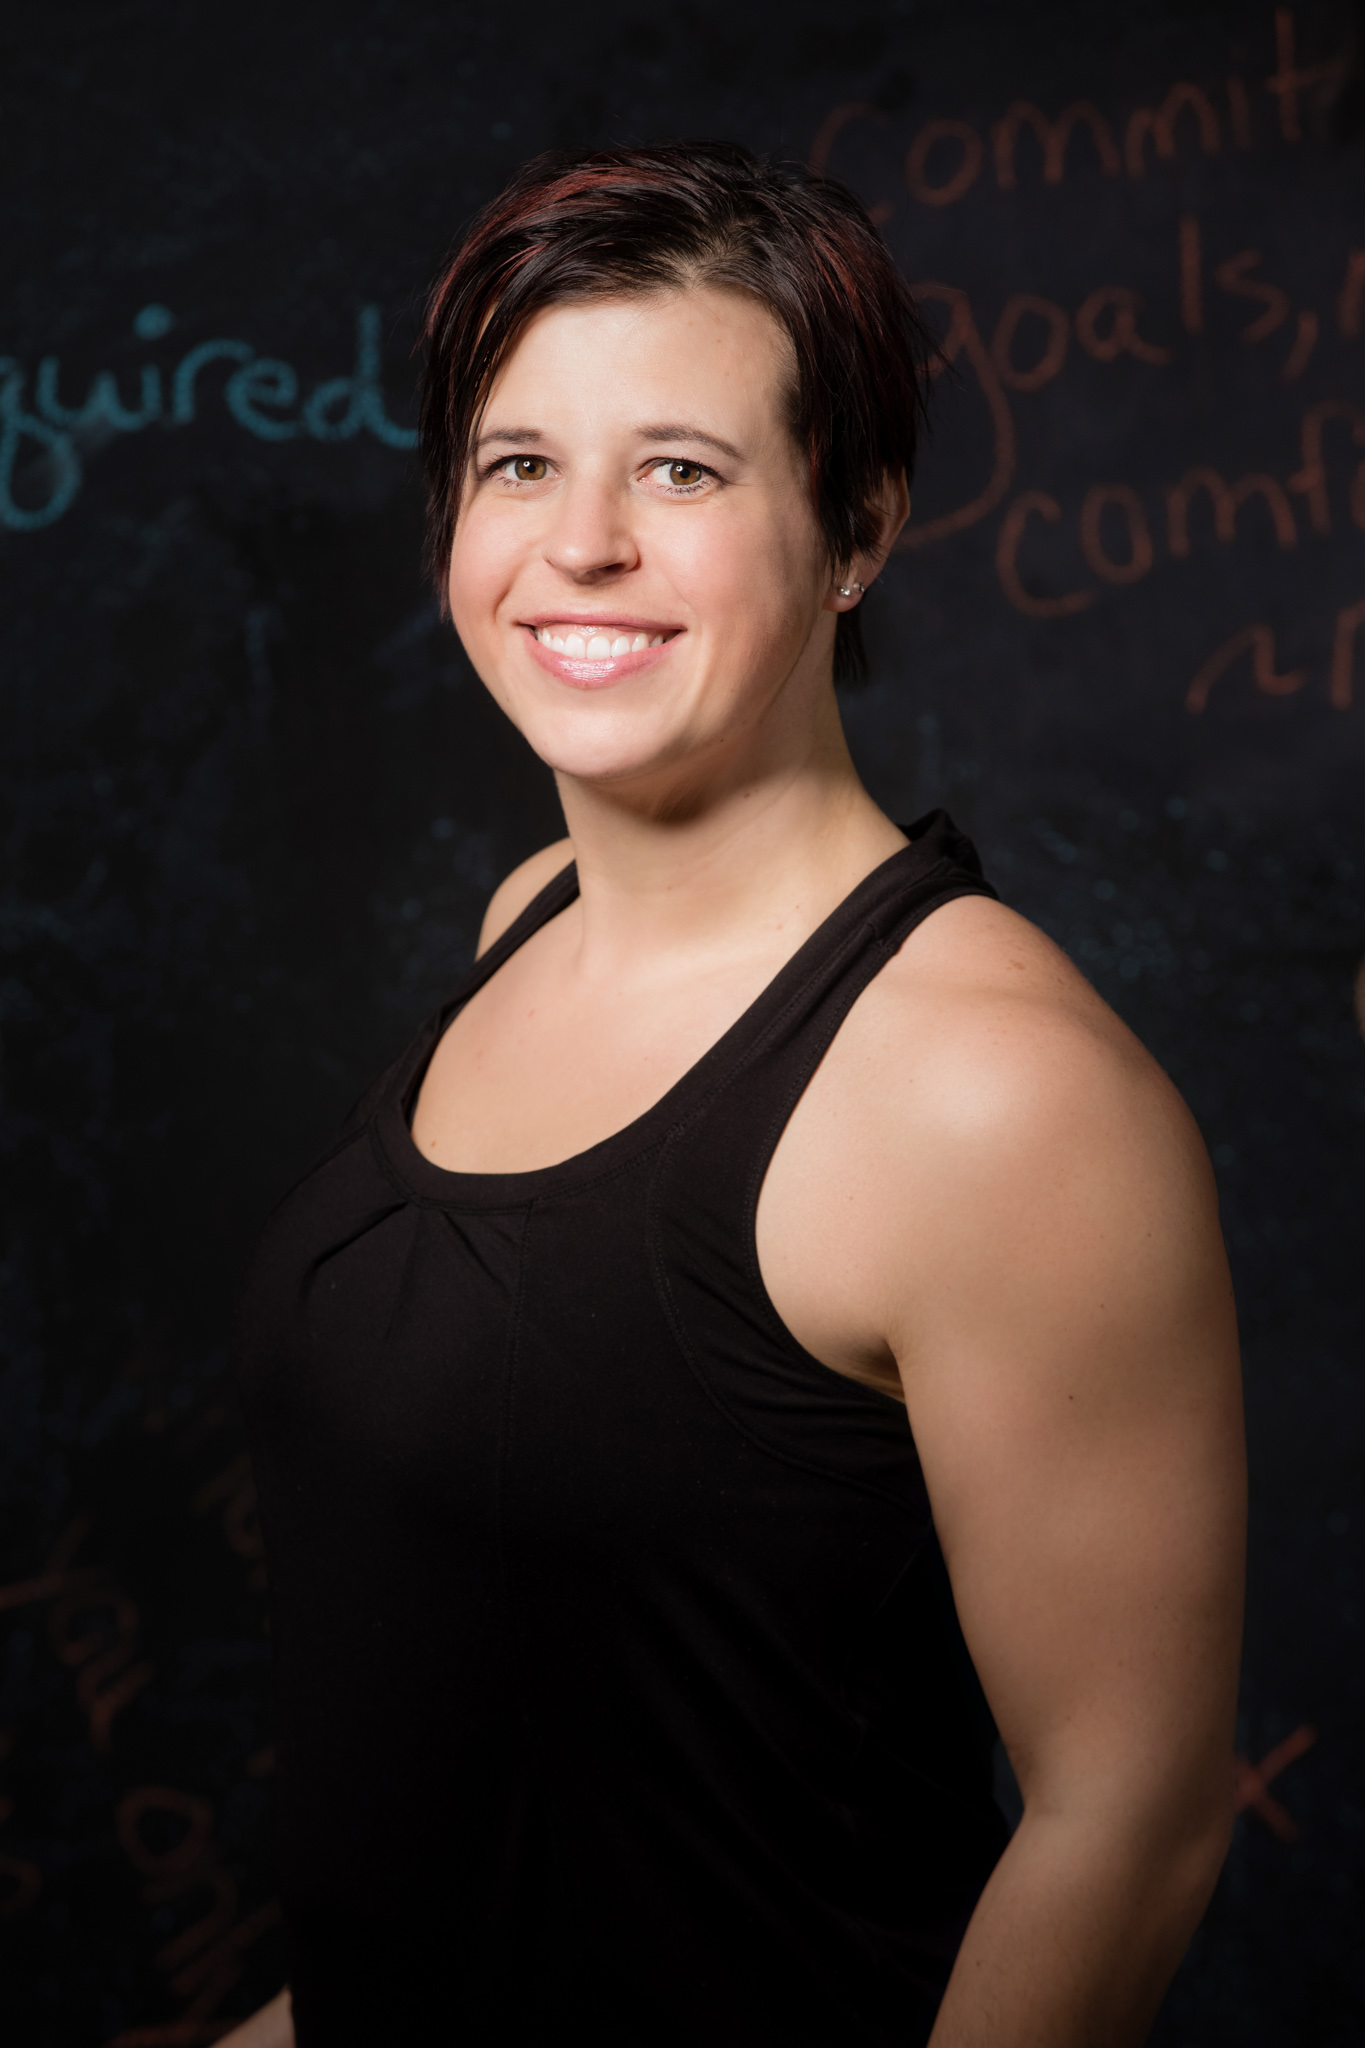 Mandy-Haenel-Raw-Power-Fitness.jpg